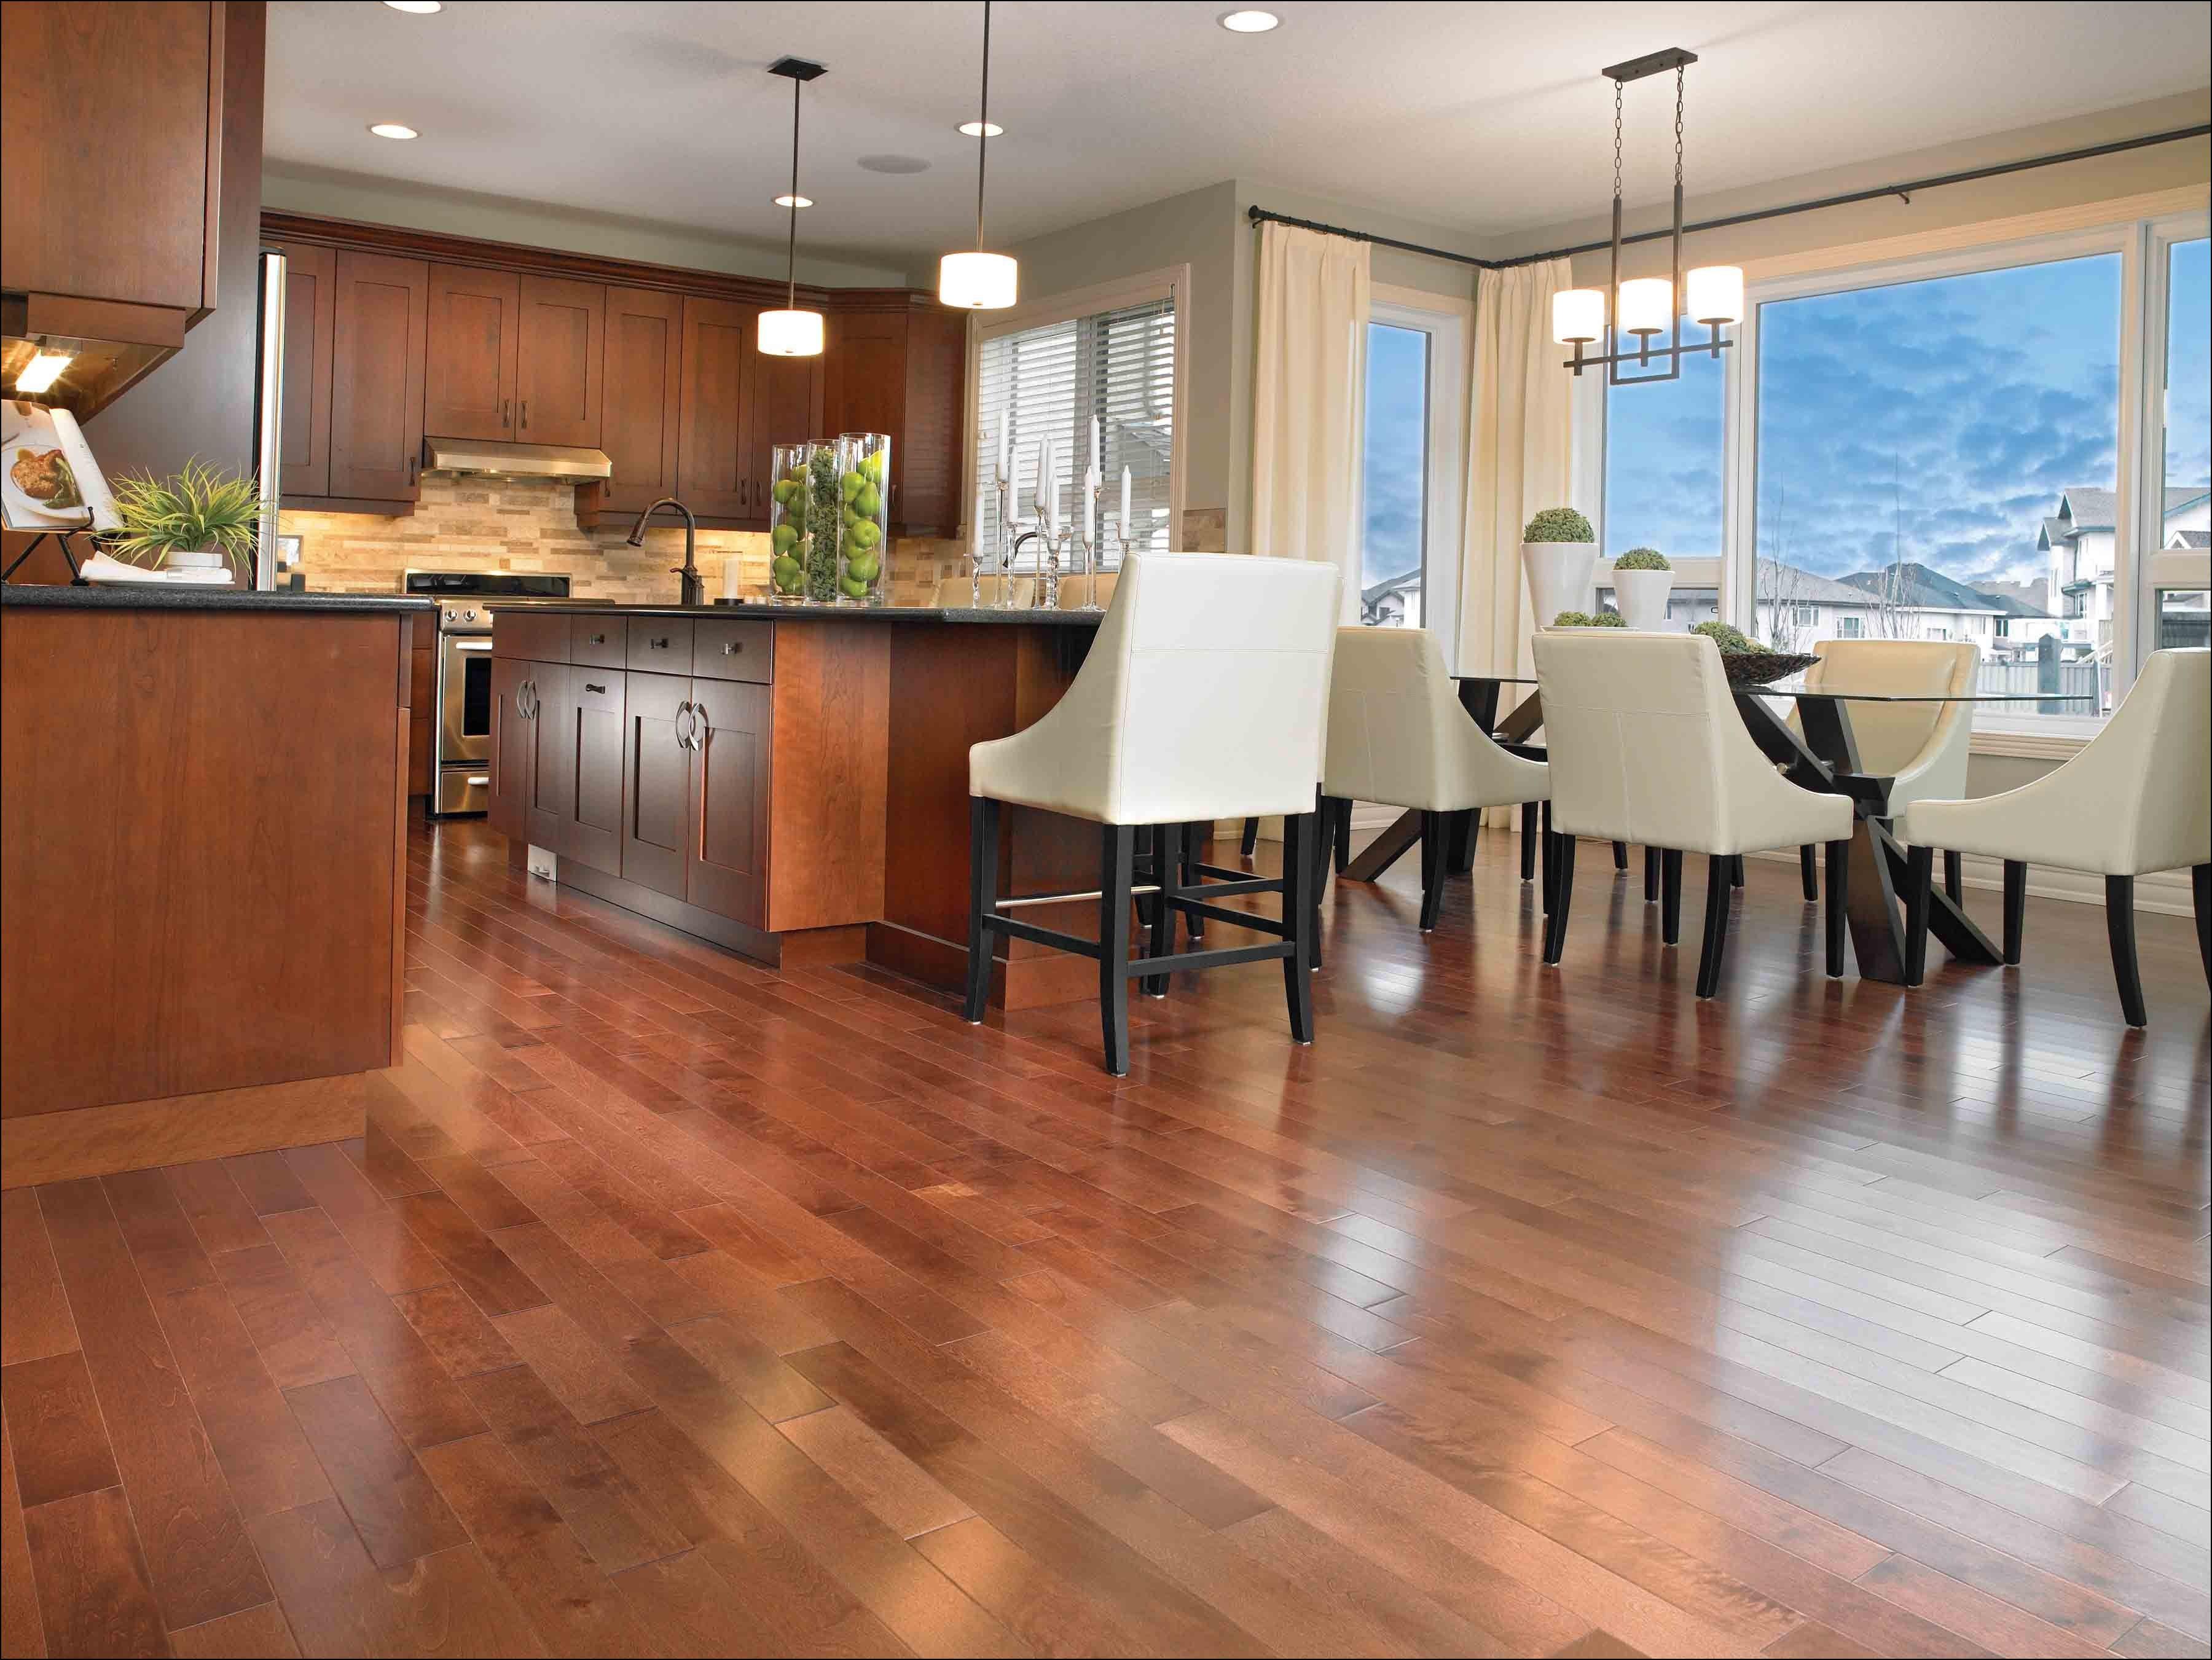 hardwood floor options home of hardwood flooring suppliers france flooring ideas intended for hardwood flooring installation san diego images 54 best exotic flooring images on pinterest of hardwood flooring